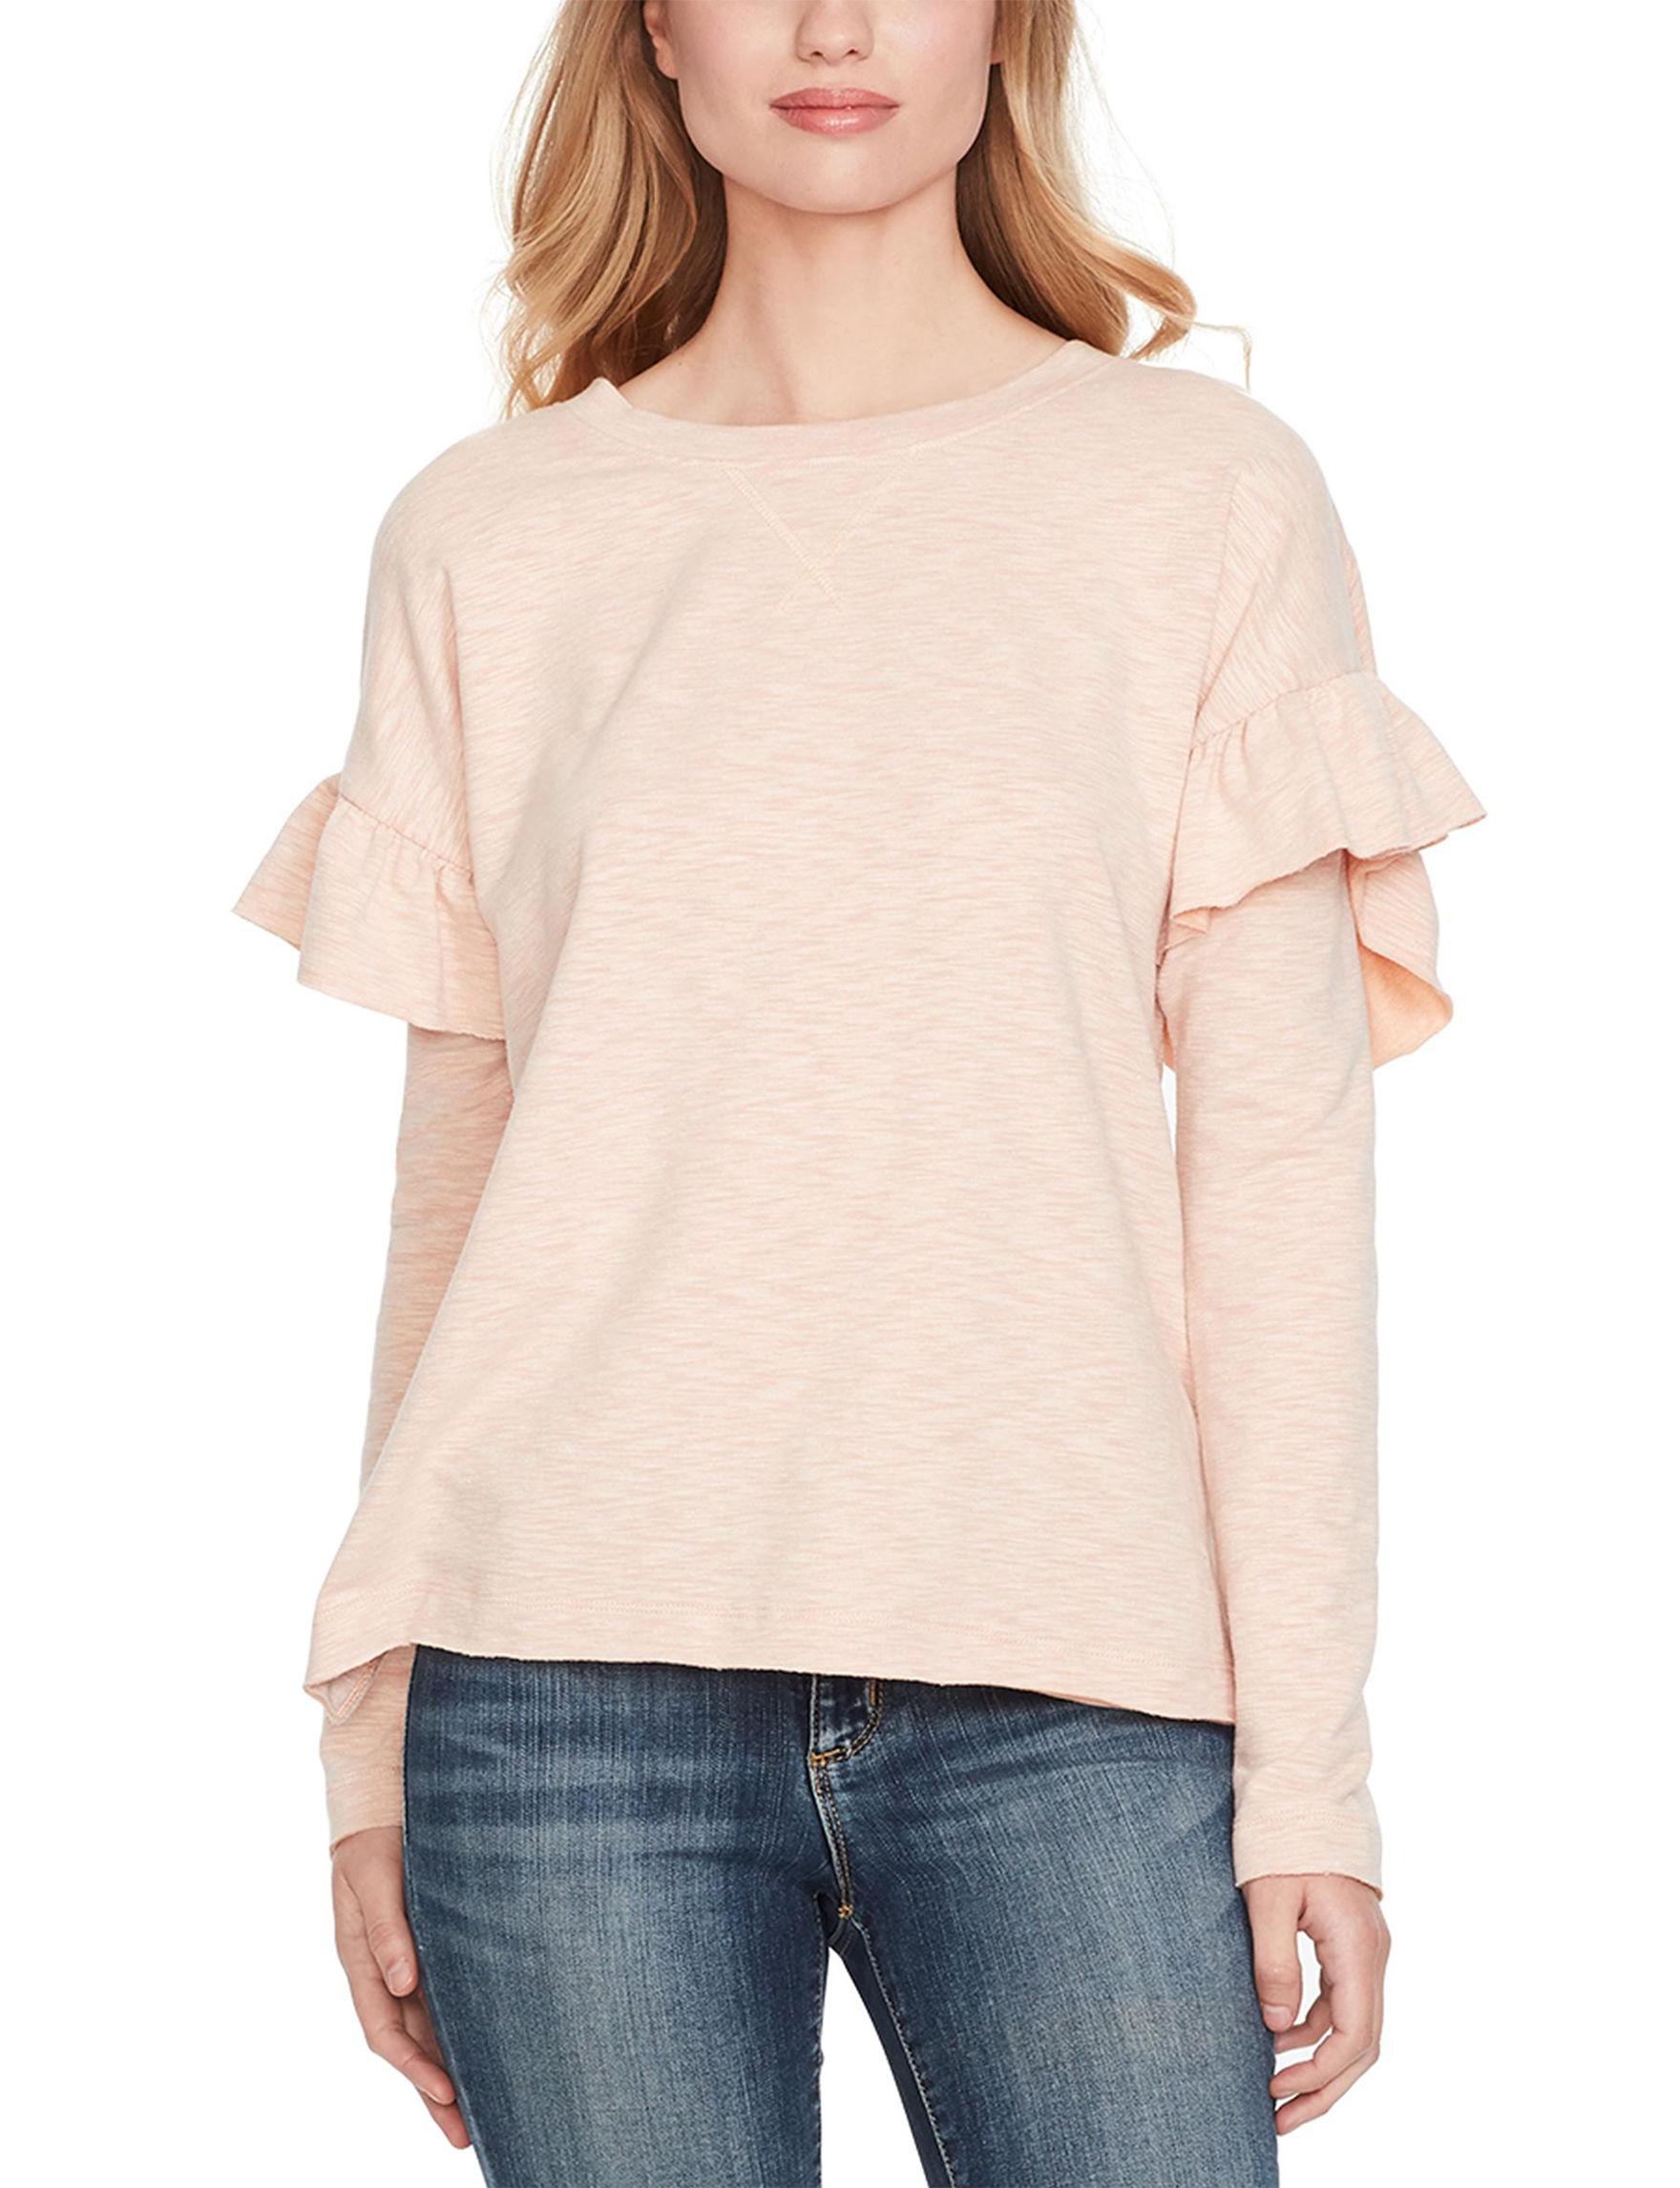 Jessica Simpson Rose Shirts & Blouses